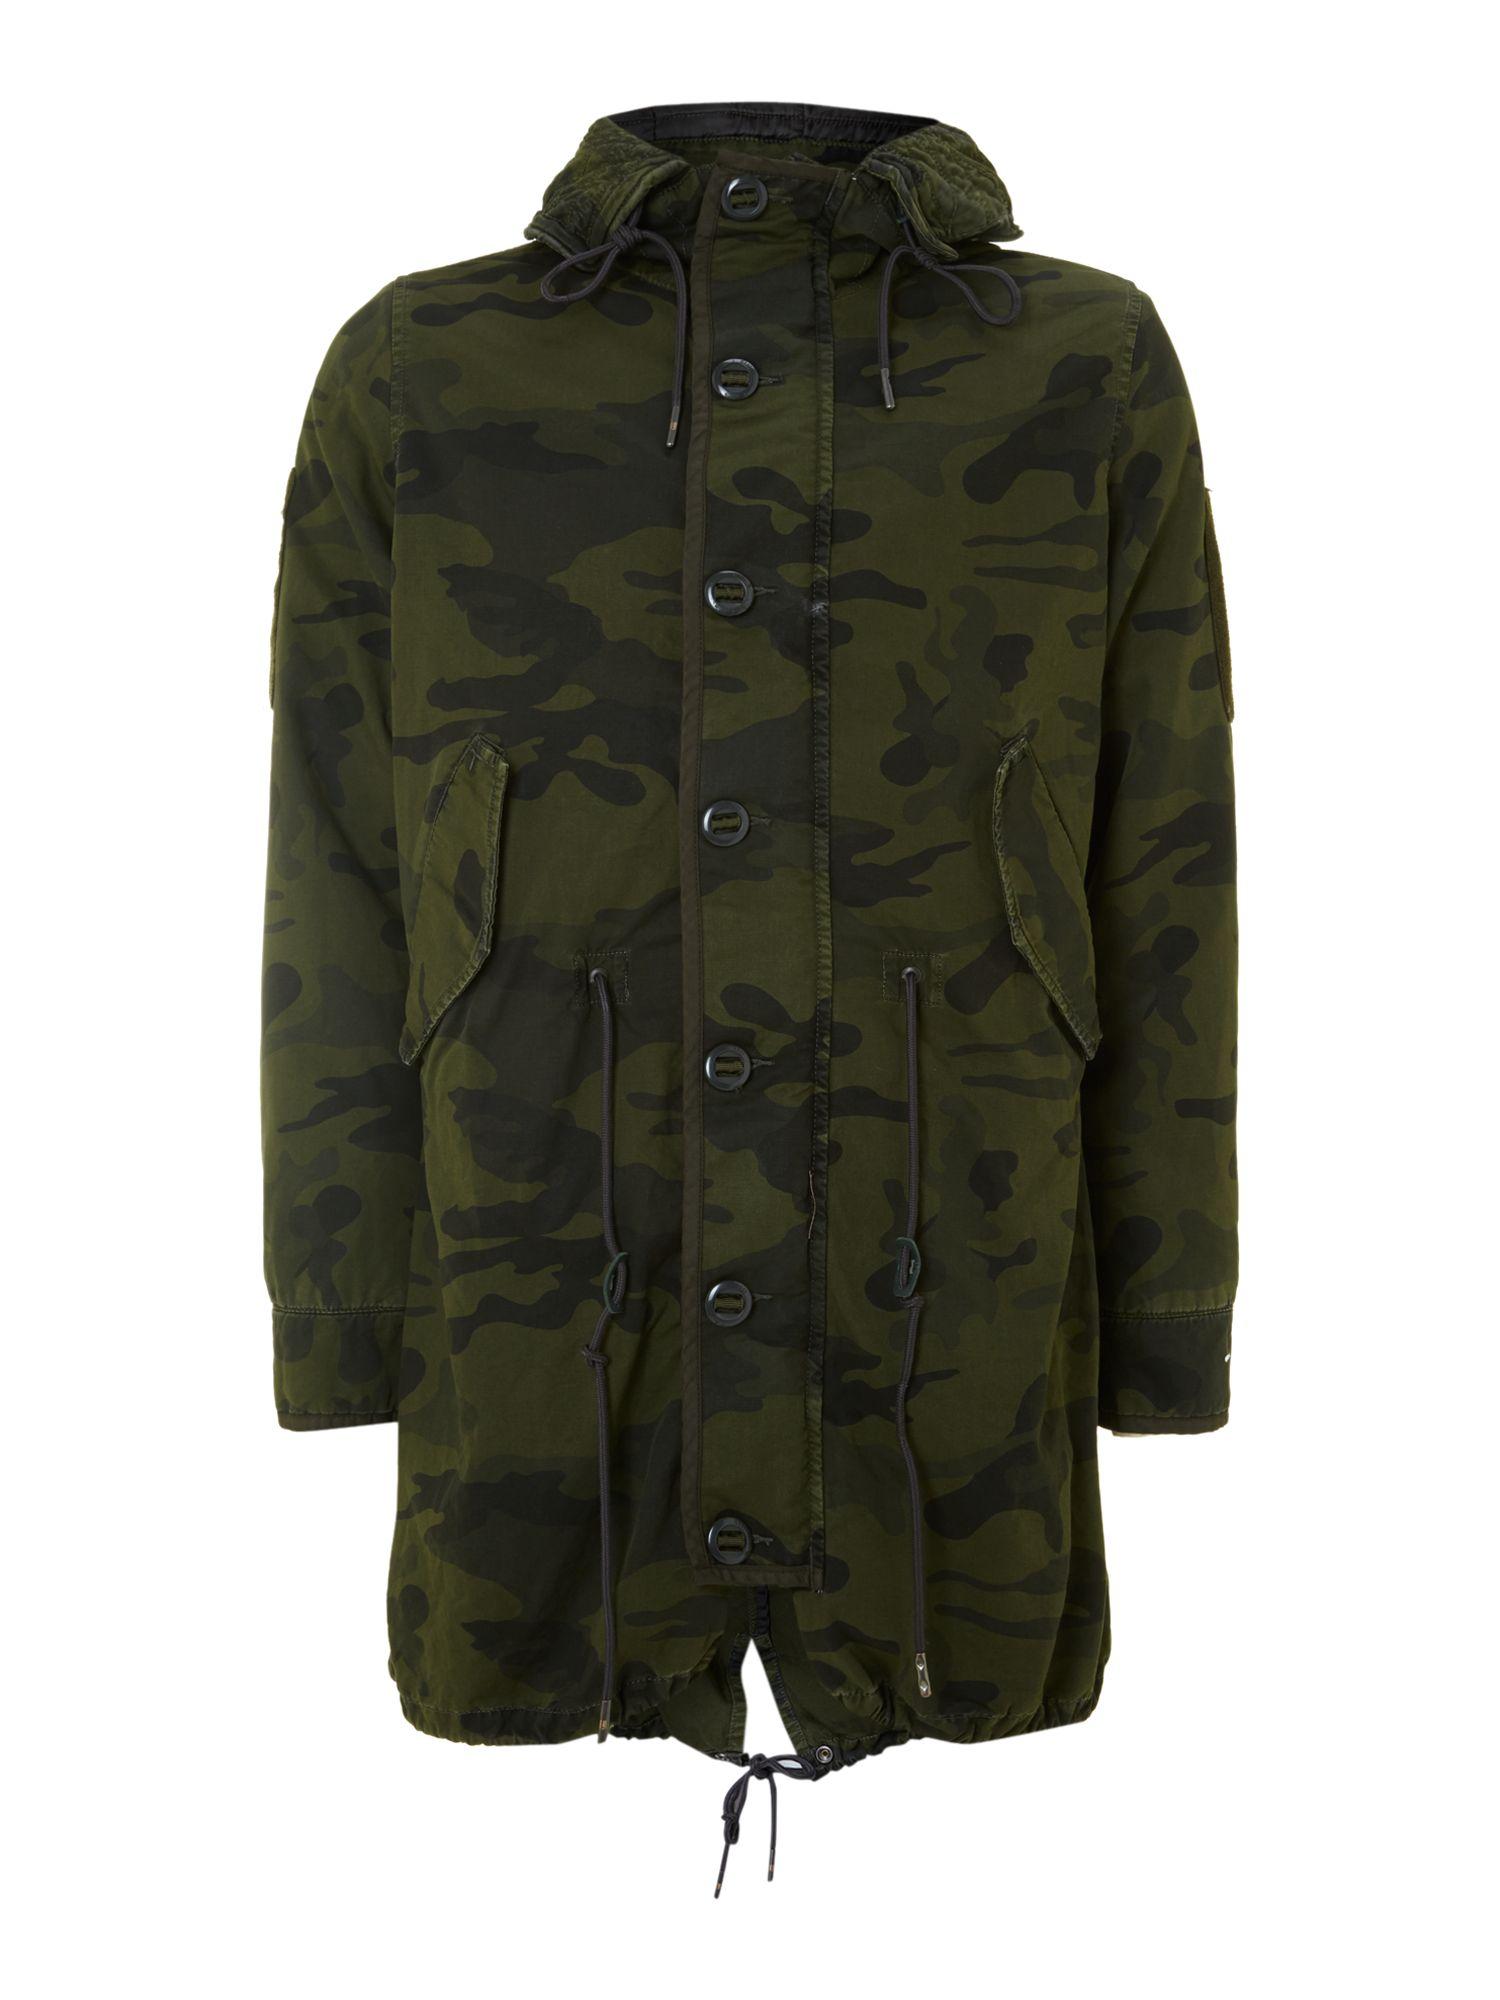 g star raw polar rain fishtail parka in green for men lyst. Black Bedroom Furniture Sets. Home Design Ideas